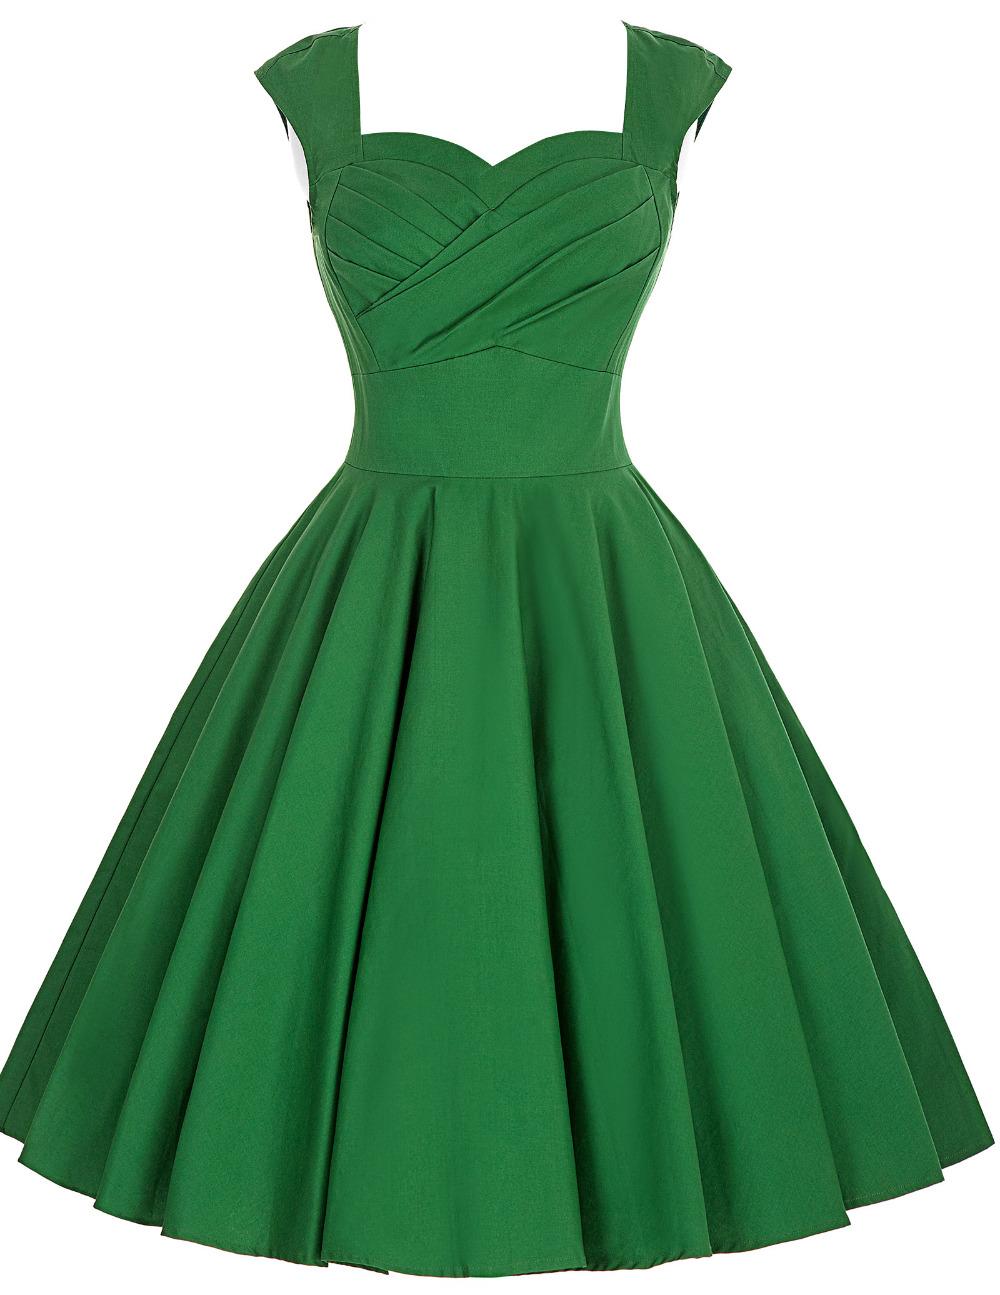 emerald green women dresses 2016 Ruched Bodice Sleeveless Solid Color cotton 50s rockabily dresses robe vintage vestidos summer Одежда и ак�е��уары<br><br><br>Aliexpress